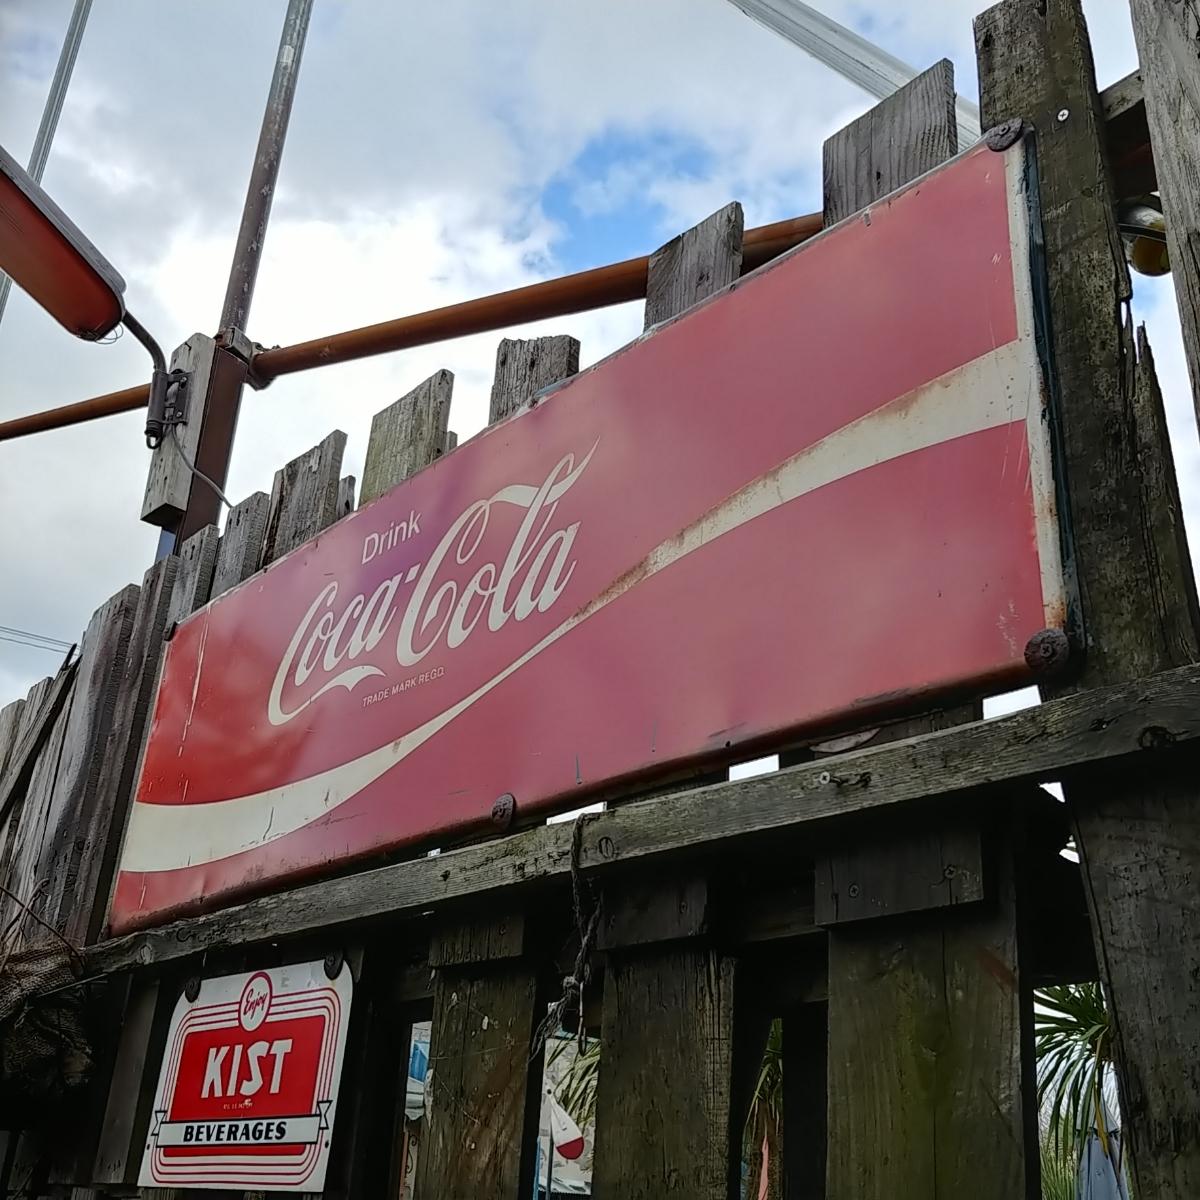 ☆AMERICAN VINTAGE SING☆Coca-Cola (コカ・コーラ)大型 フロント看板(非売品)#店舗什器#世田谷ベース #ガレージライフ_画像5